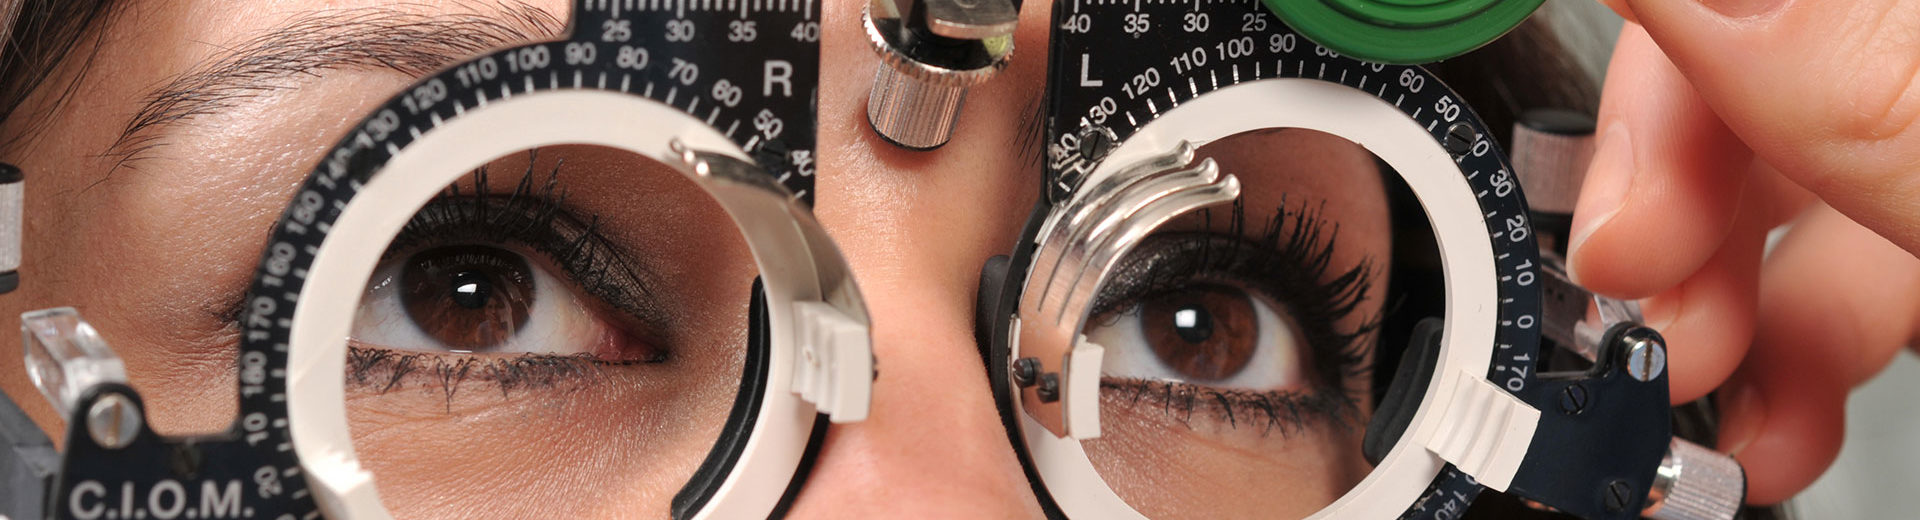 important o regular checkup eye